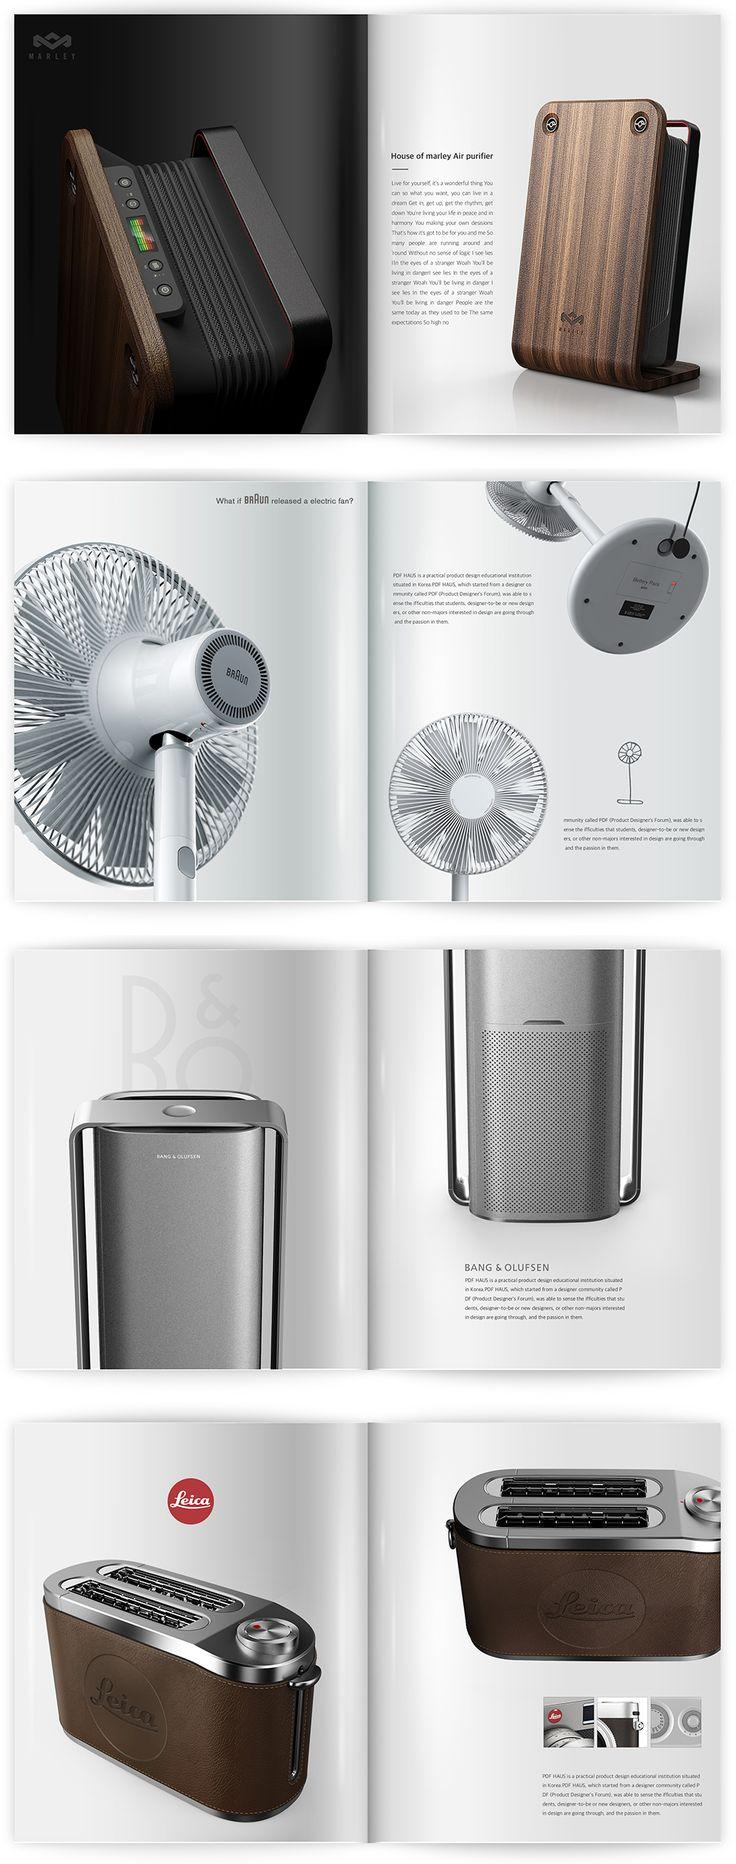 Product design / Industrial design / 제품디자인 / 산업디자인 /Industrial / book / Brochure / Banner /design /                                                                                                                                                                                 More